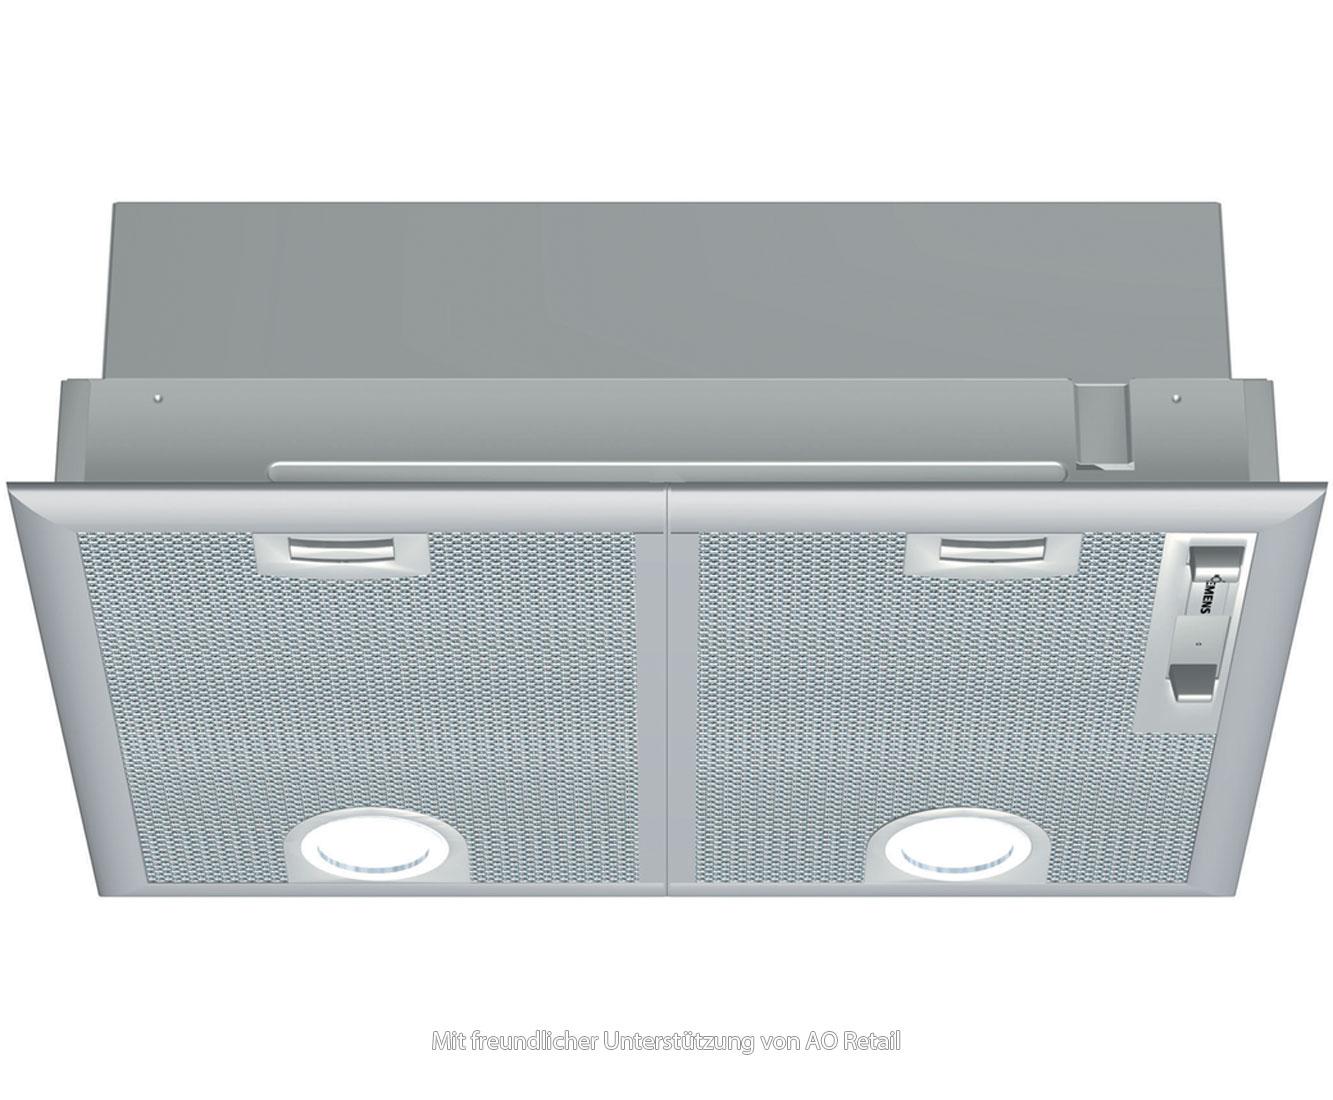 Siemens dunstabzugshaube ohne motor dunstabzugshaube externer